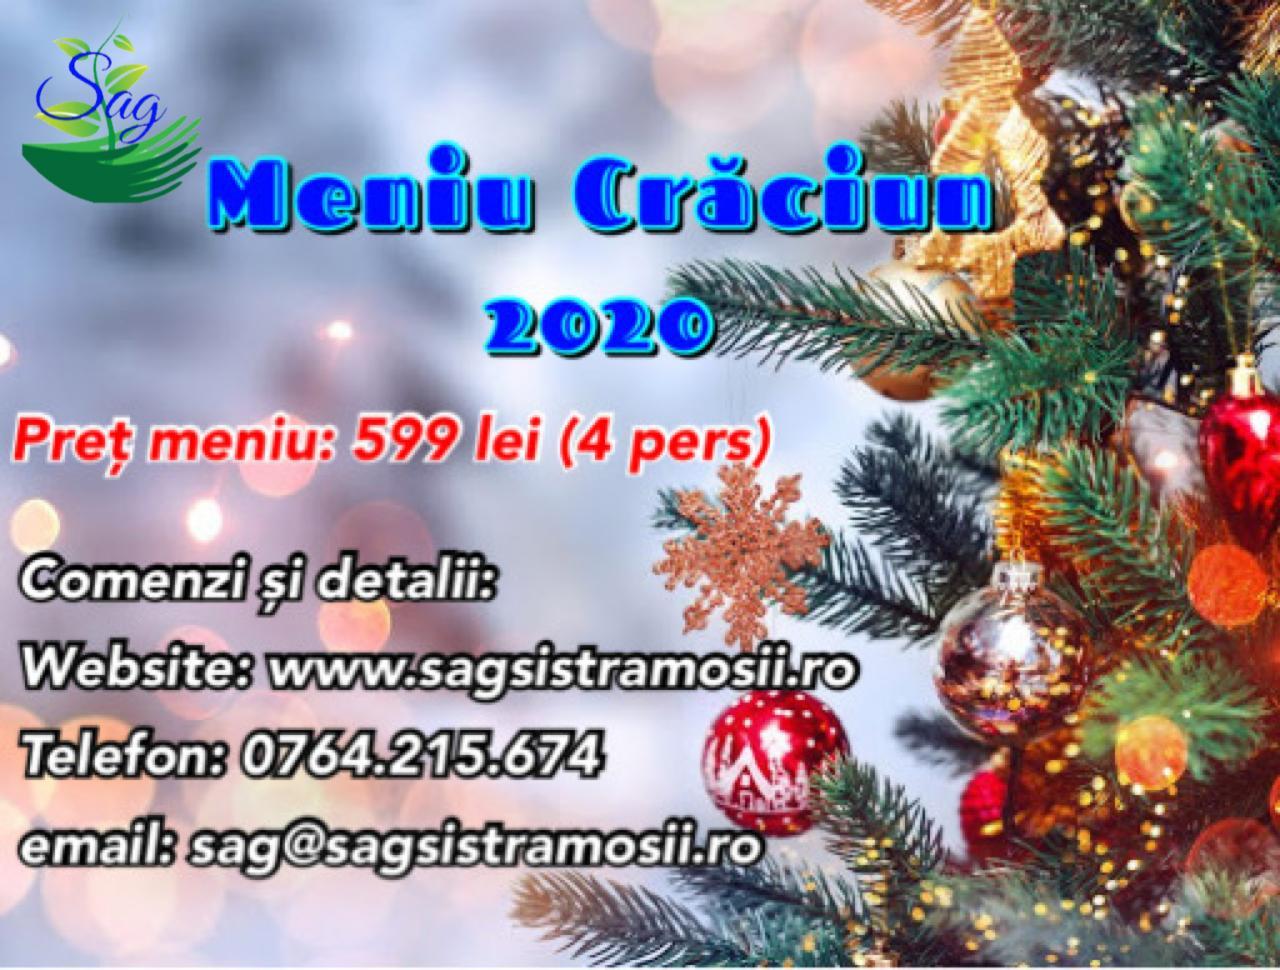 Meniu de Craciun cu livrare de la SAG Catering Meniu de Craciun cu livrare de la SAG Catering